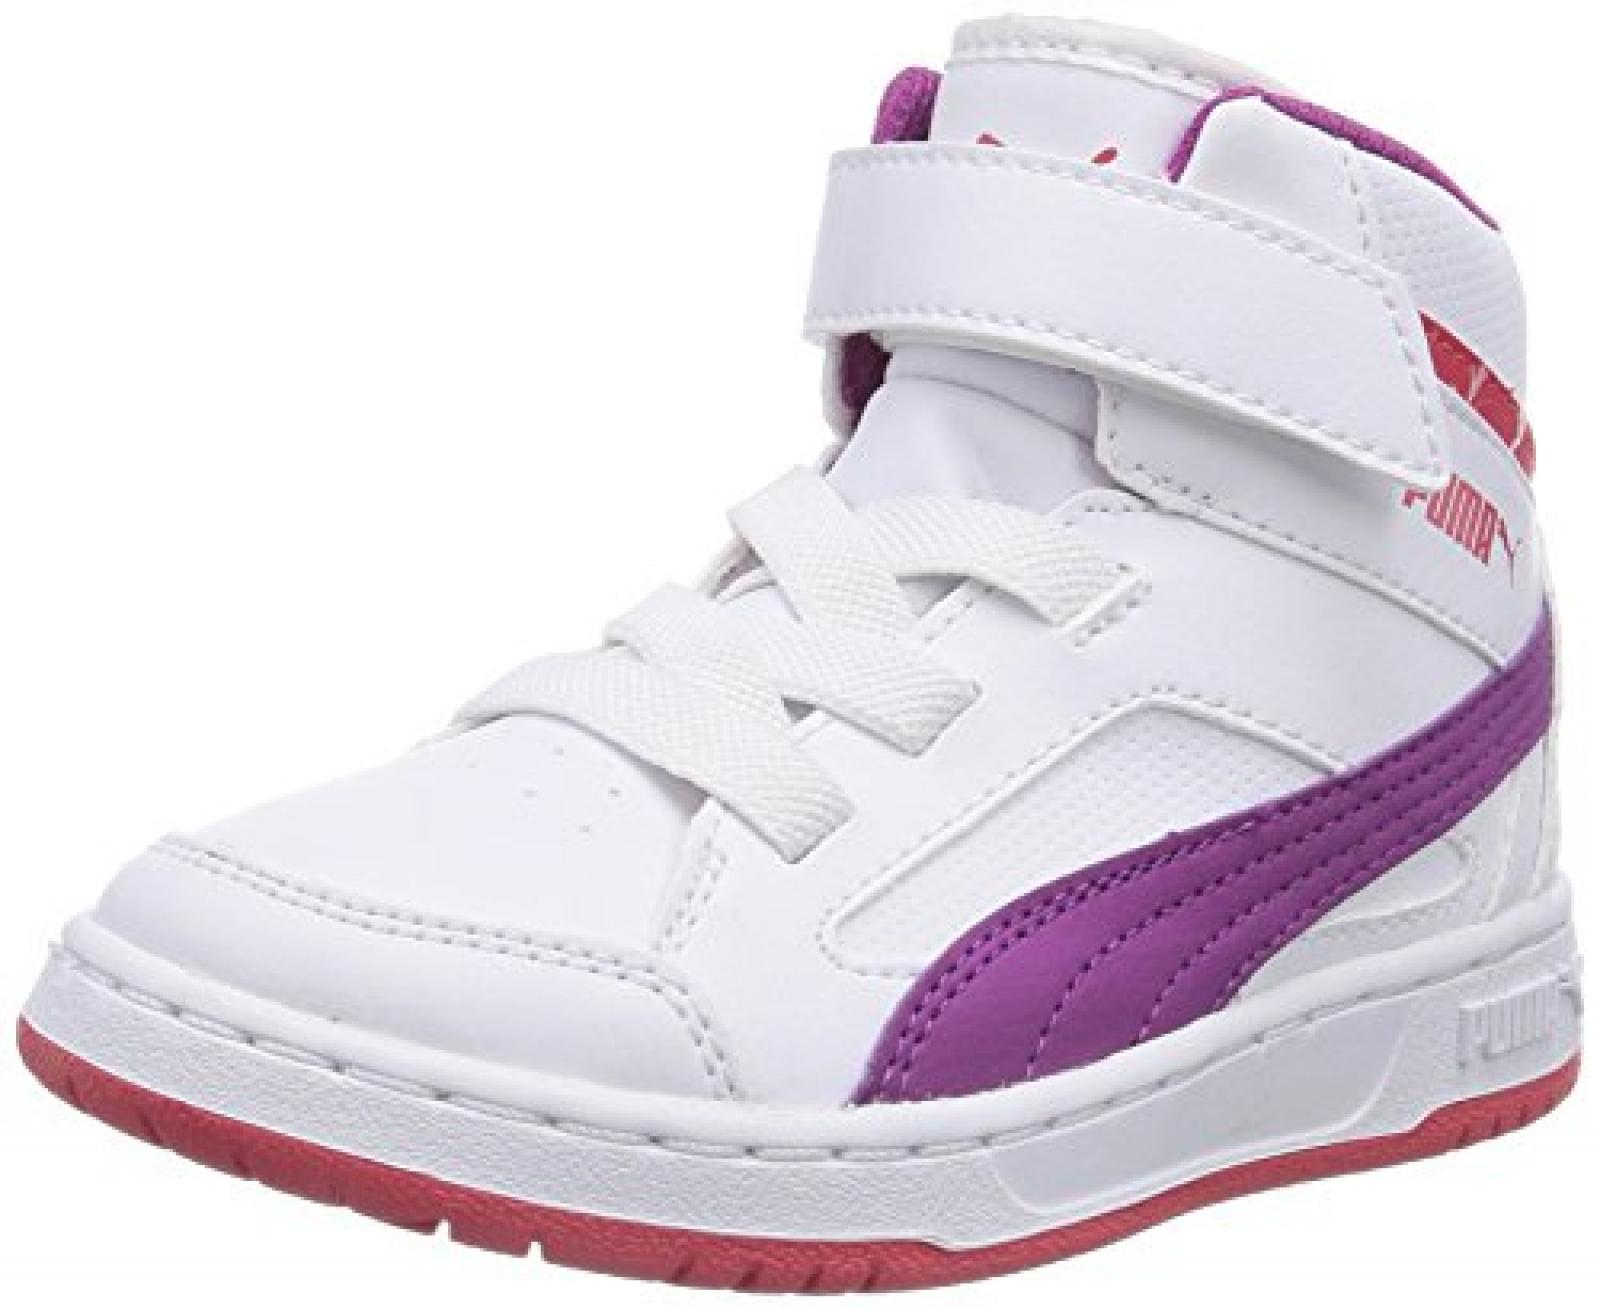 Puma Rebound v2 Hi Unisex-Kinder Hohe Sneakers